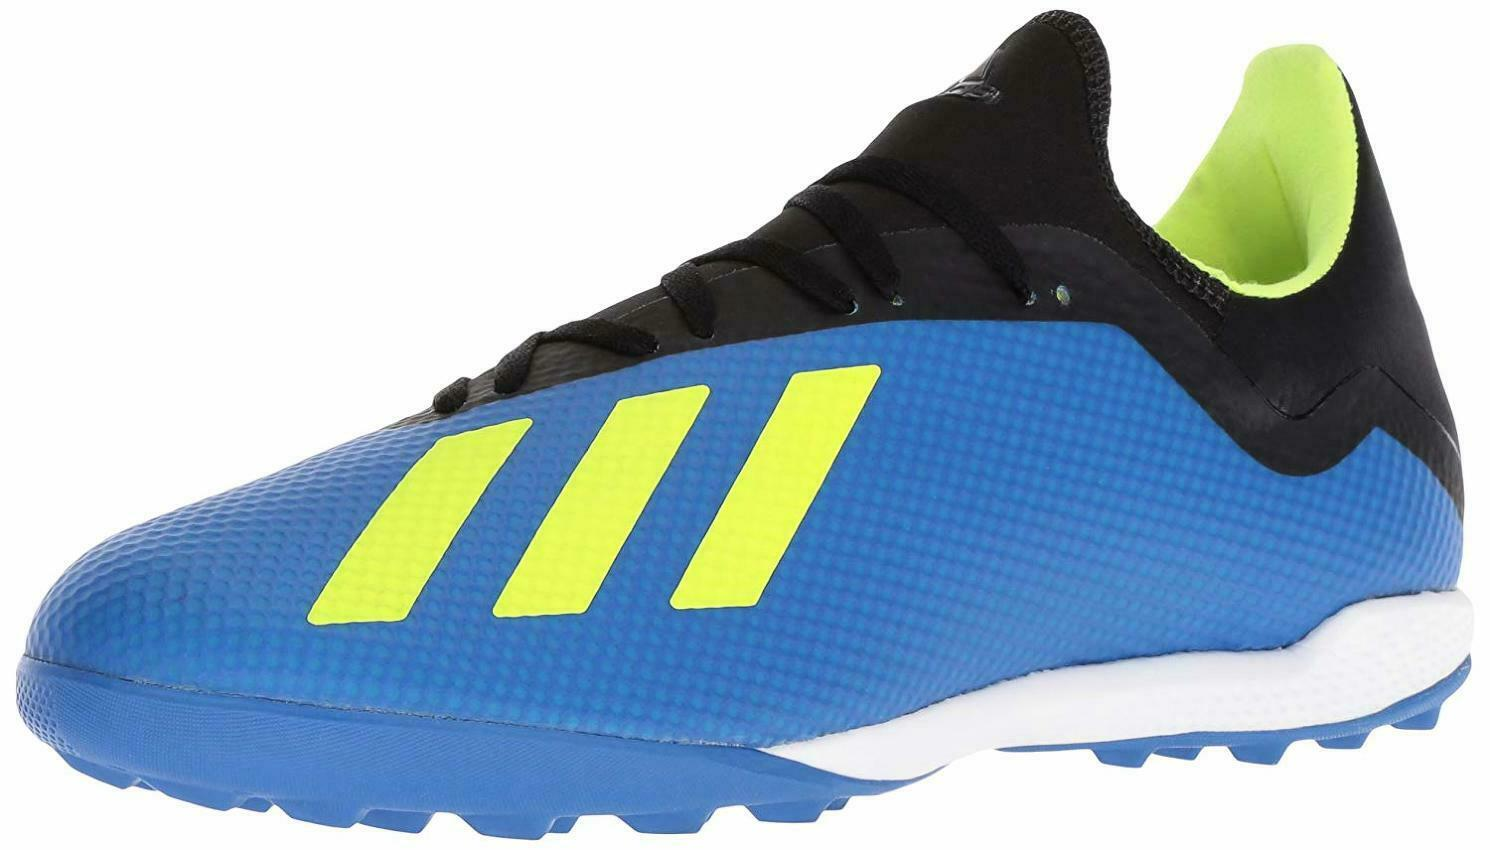 Adidas Men's X Tango 18.3 Turf Soccer shoes